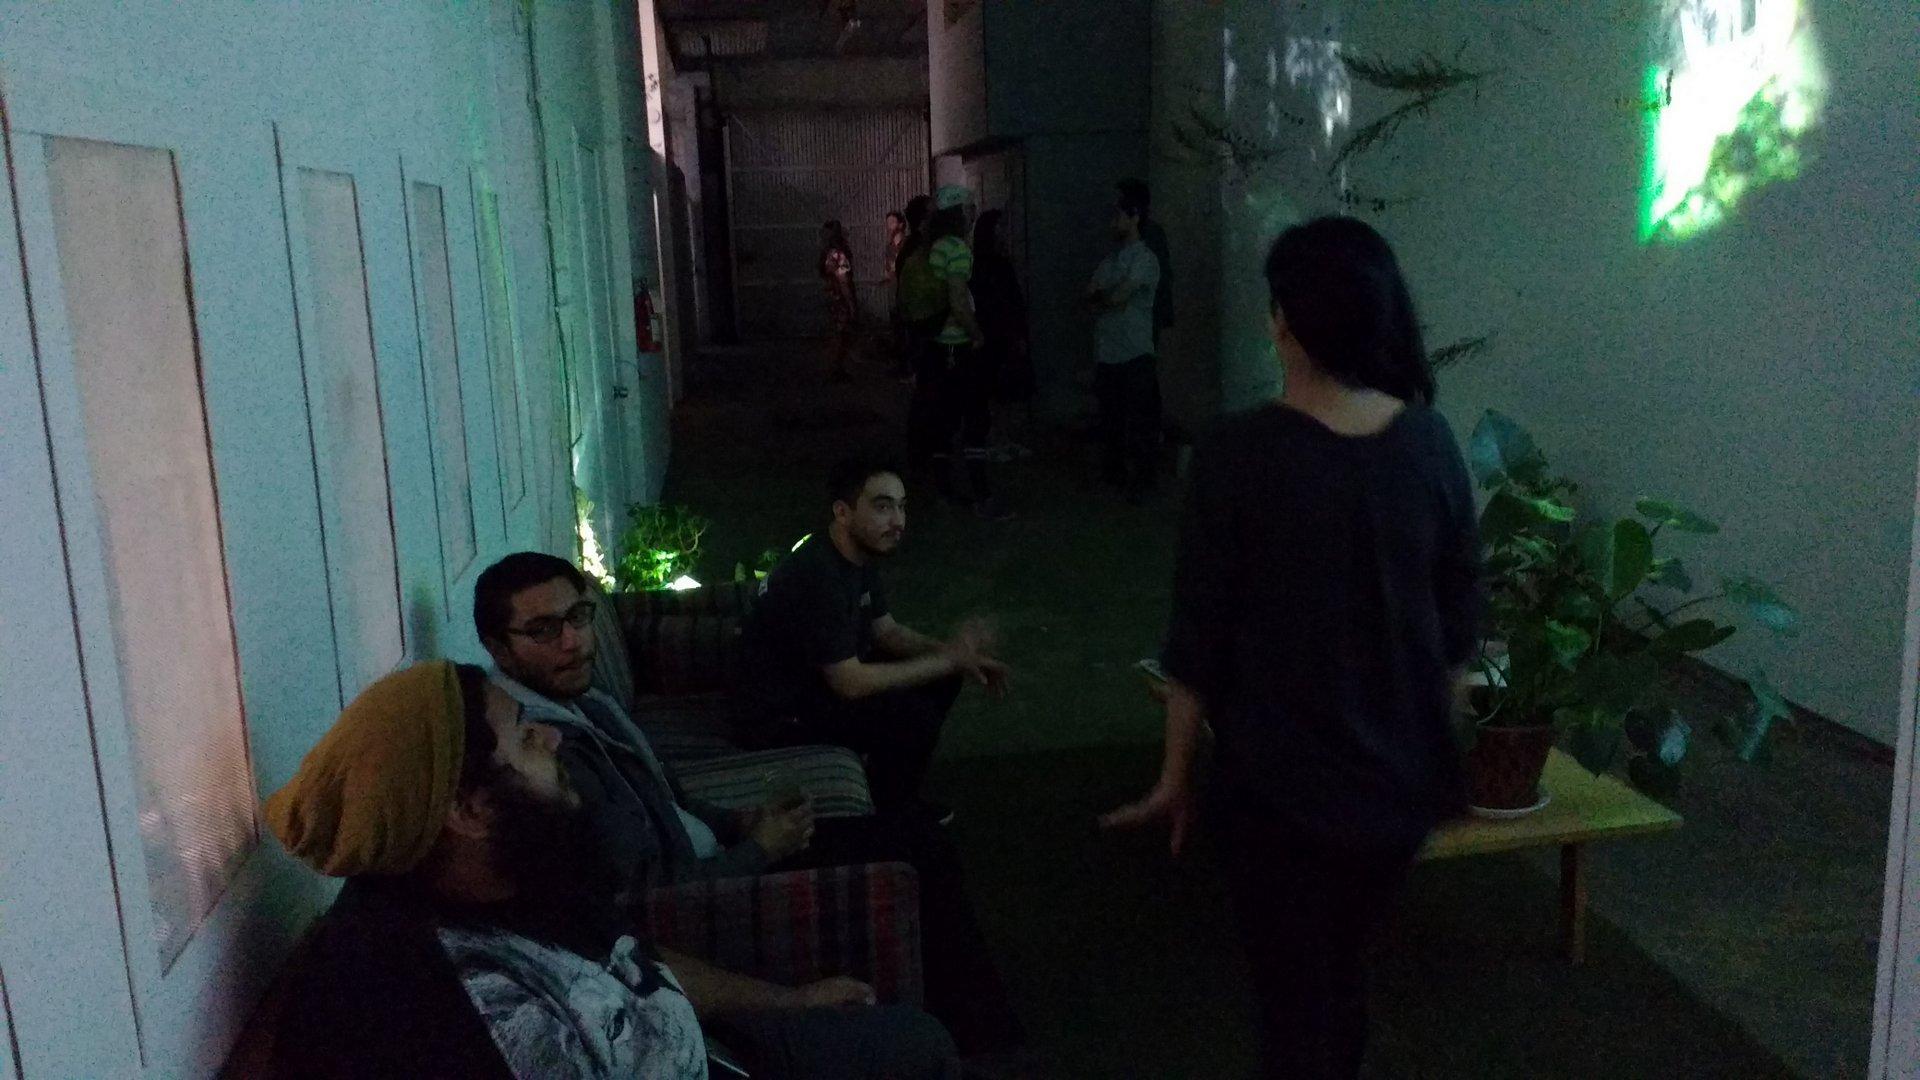 a long, dark hallway with various art installations